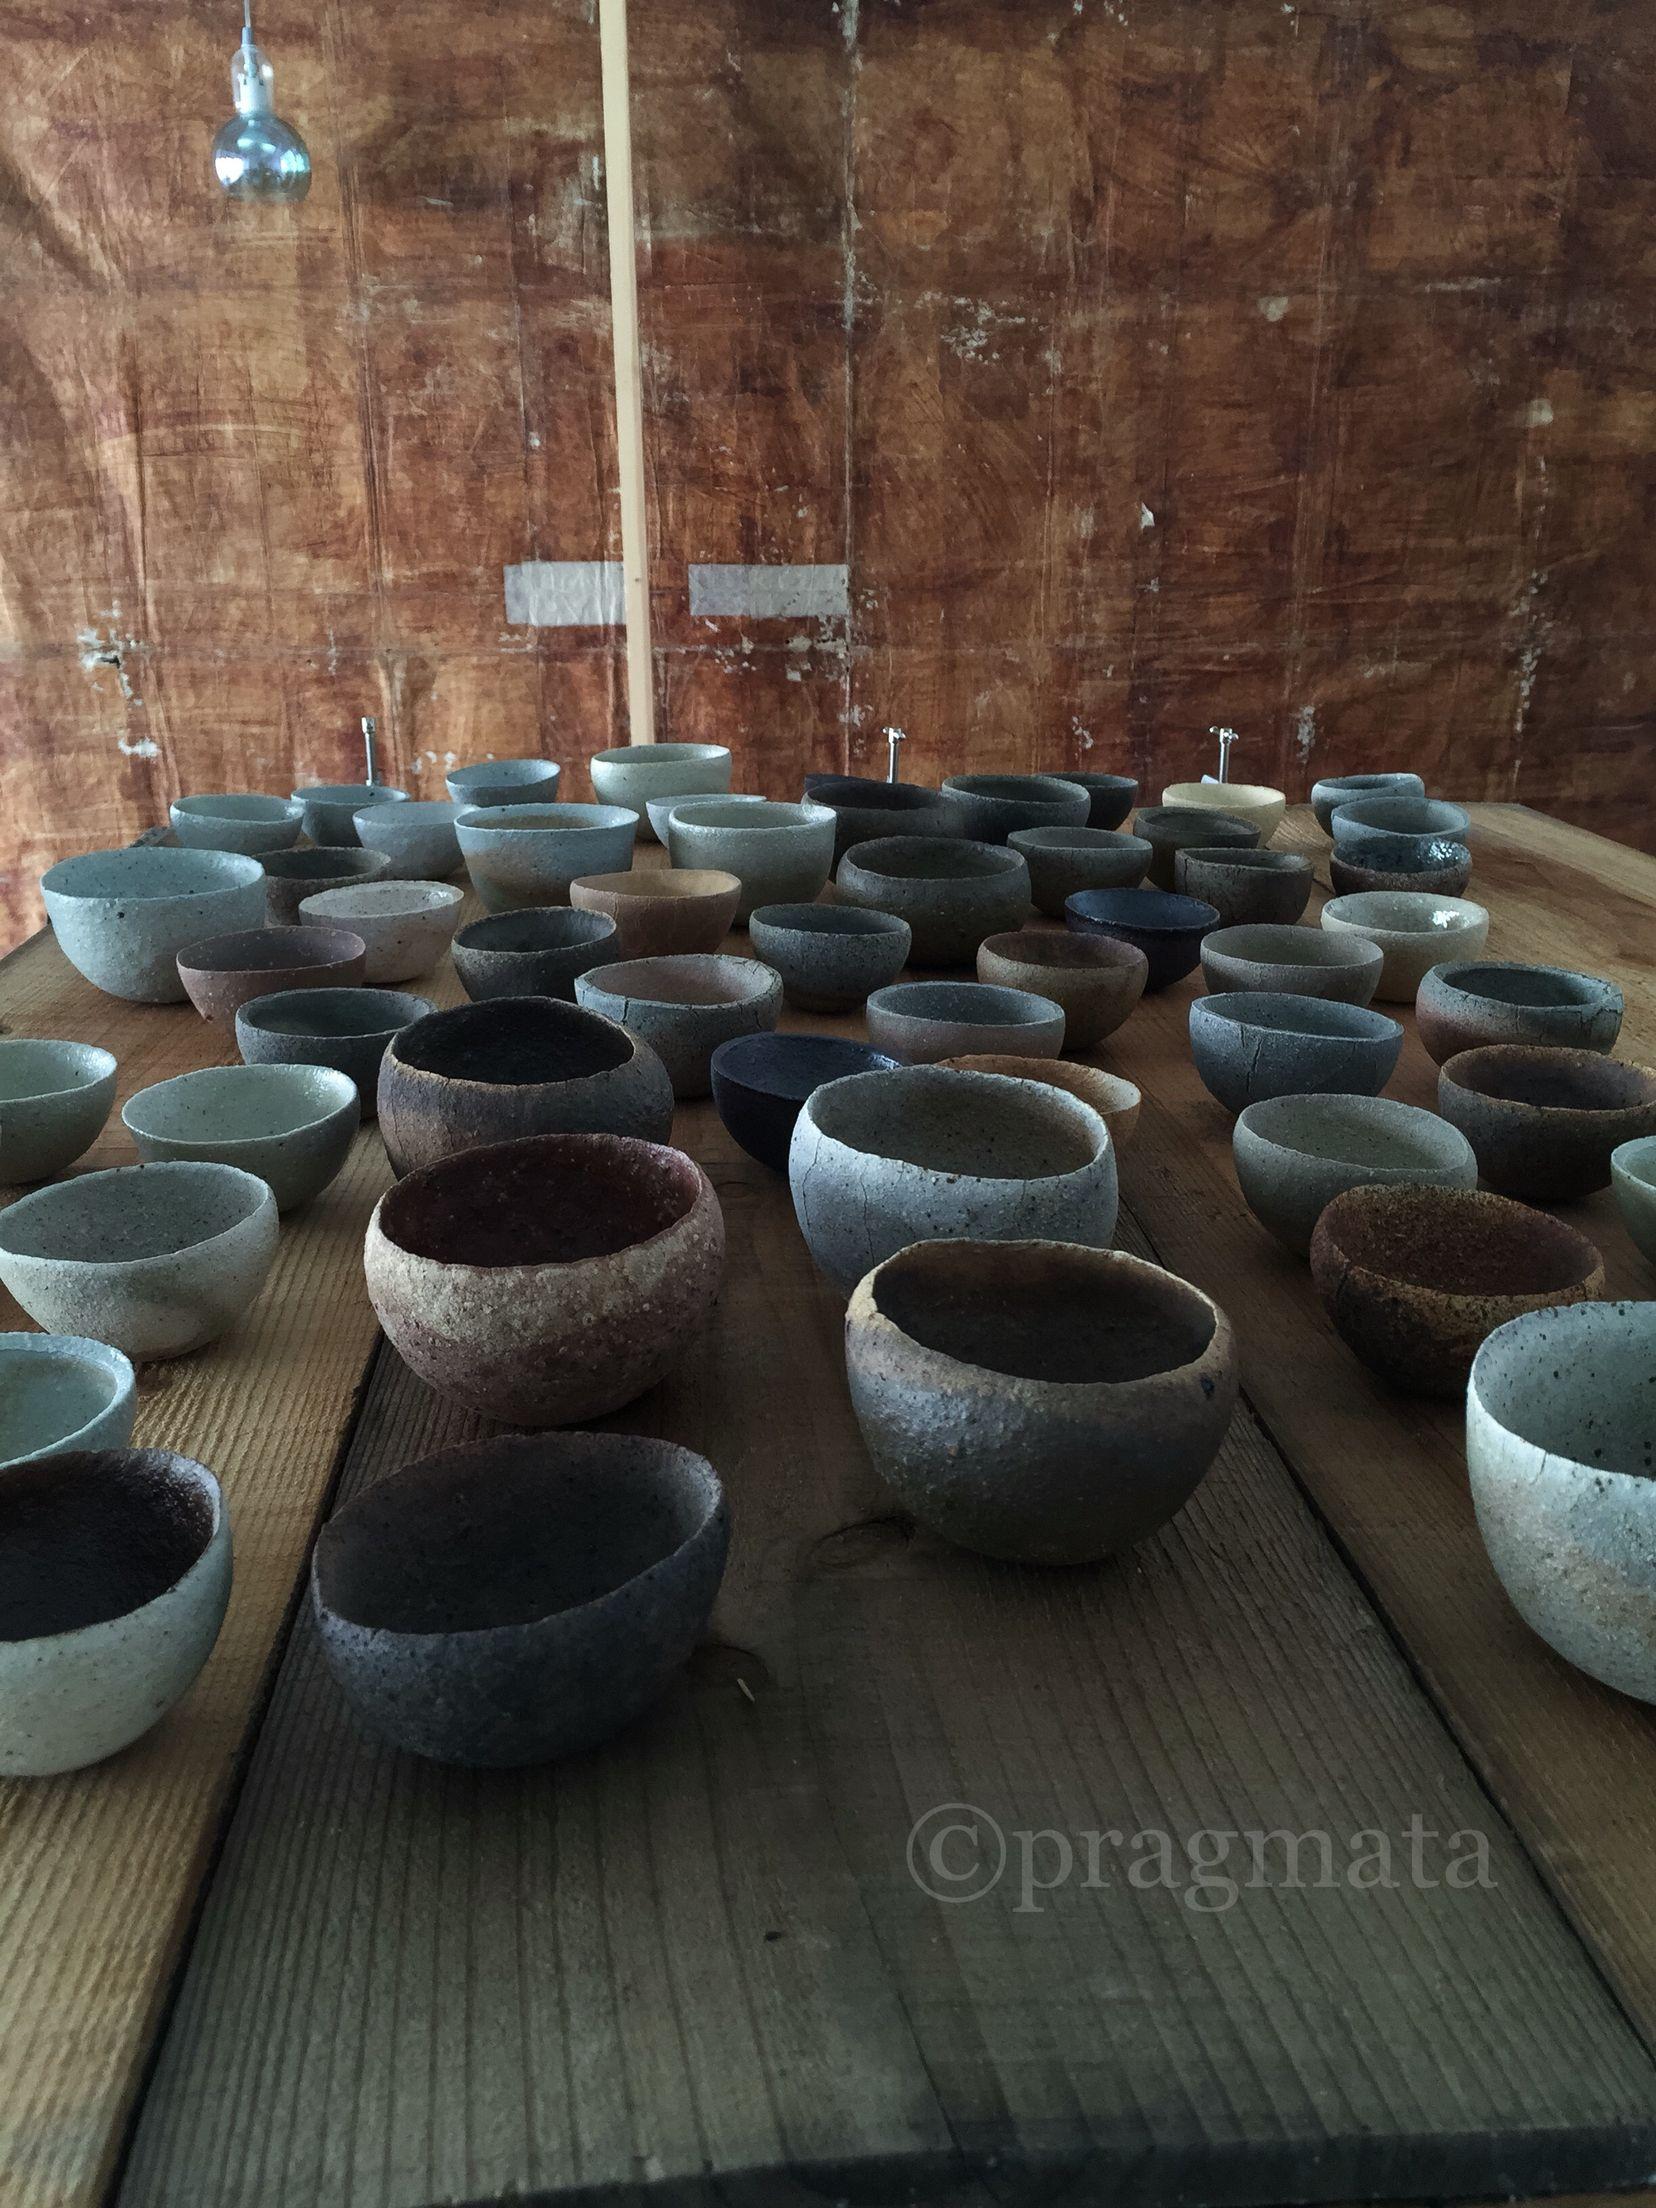 """Rice fields"" Watanabe Takayuki ceramics exhibition  「水田」 渡辺隆之 陶芸 個展 #pragmata"